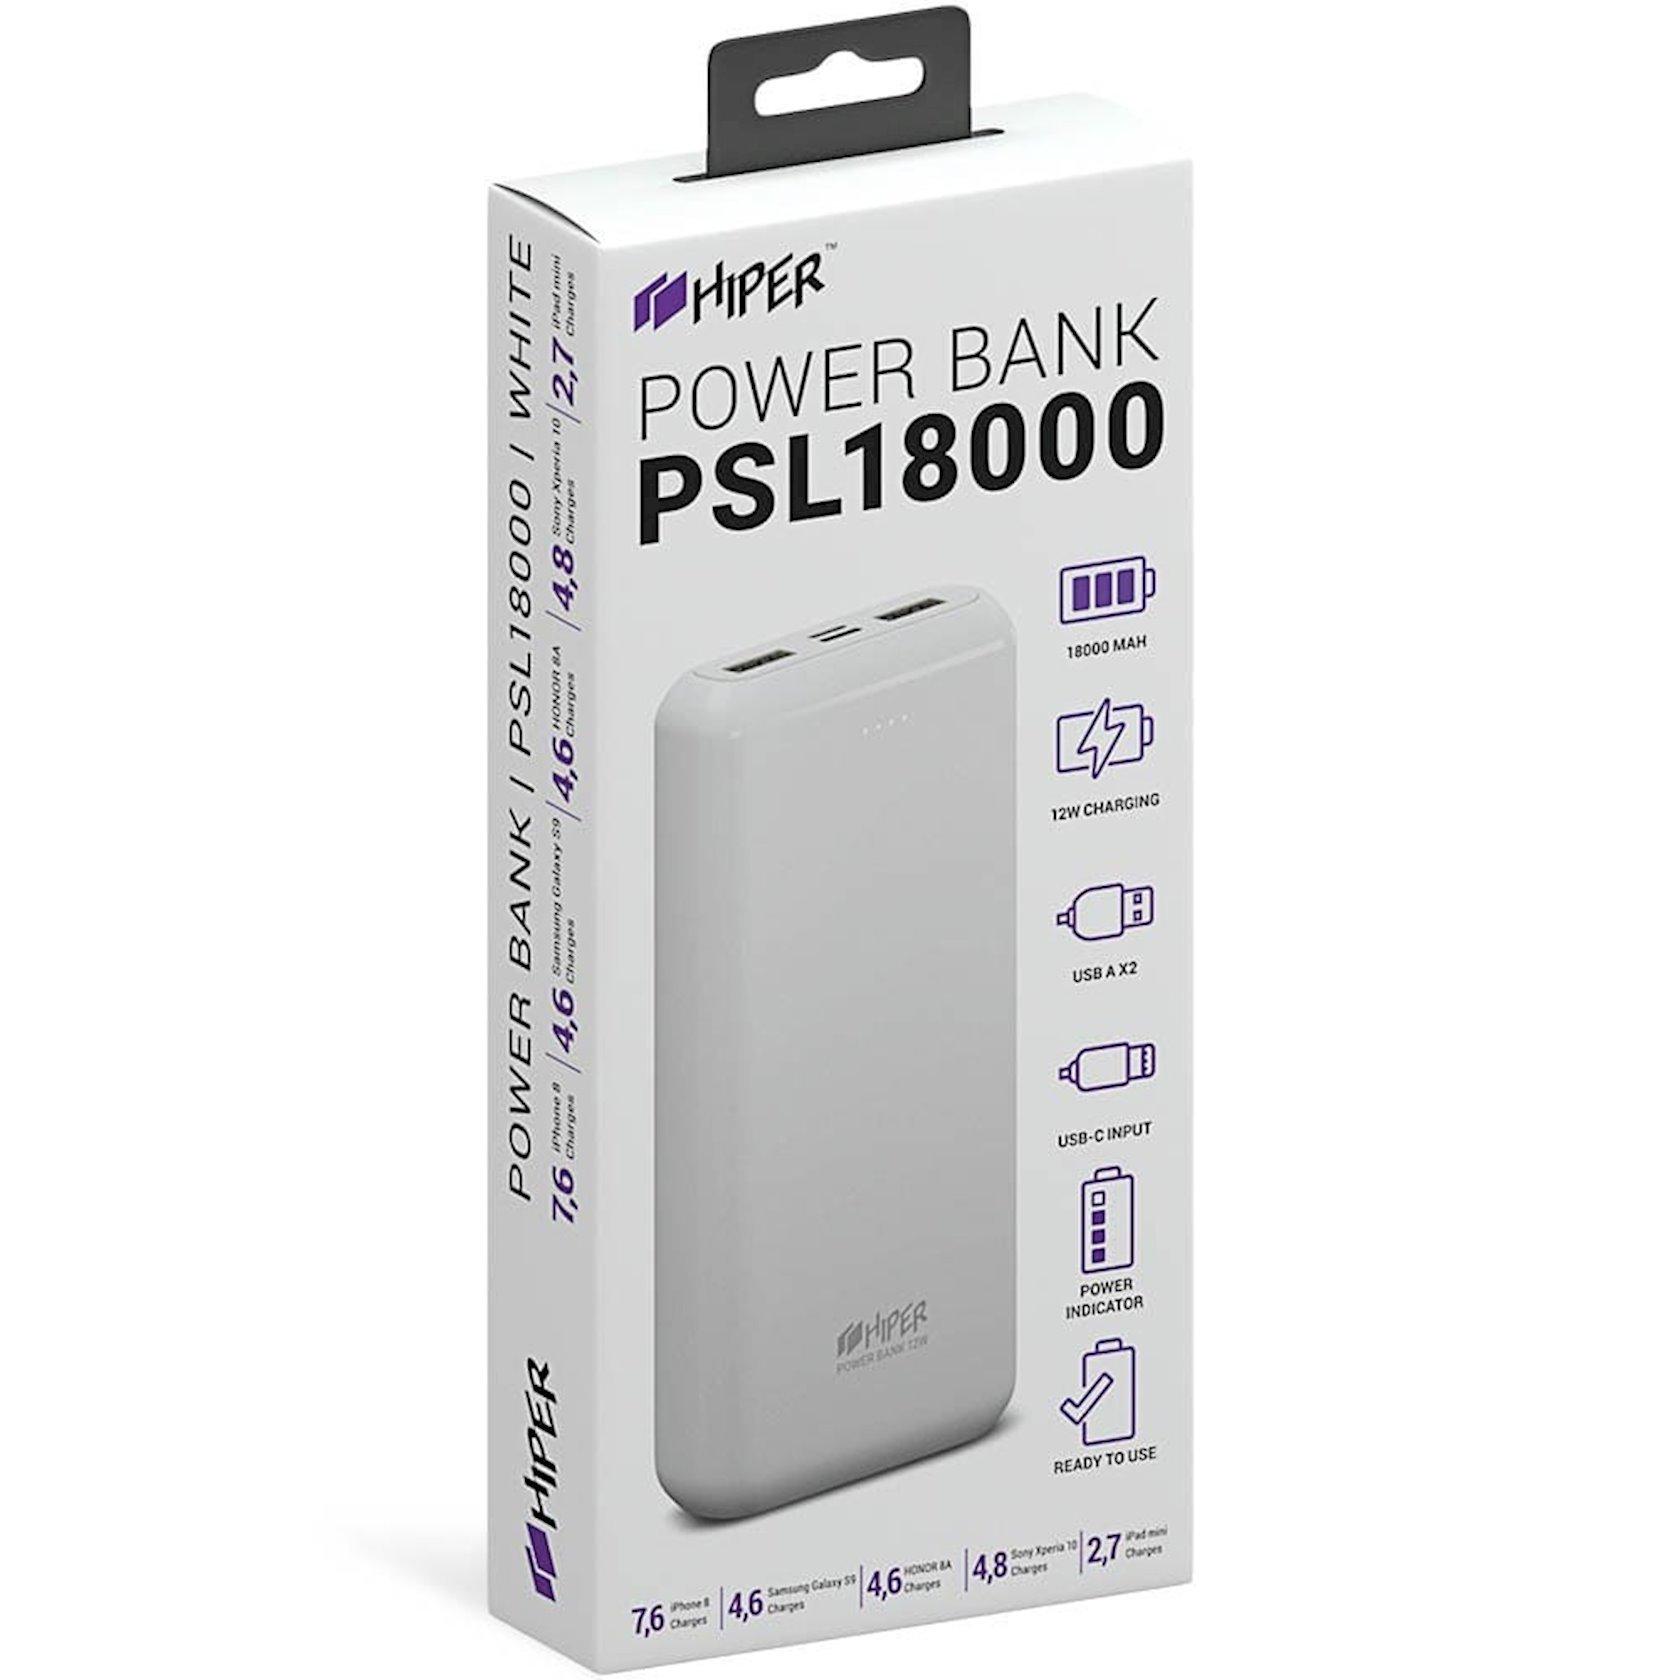 Xarici akkumulyator Hiper Power Bank 18000 mA/saat PSL18000 White